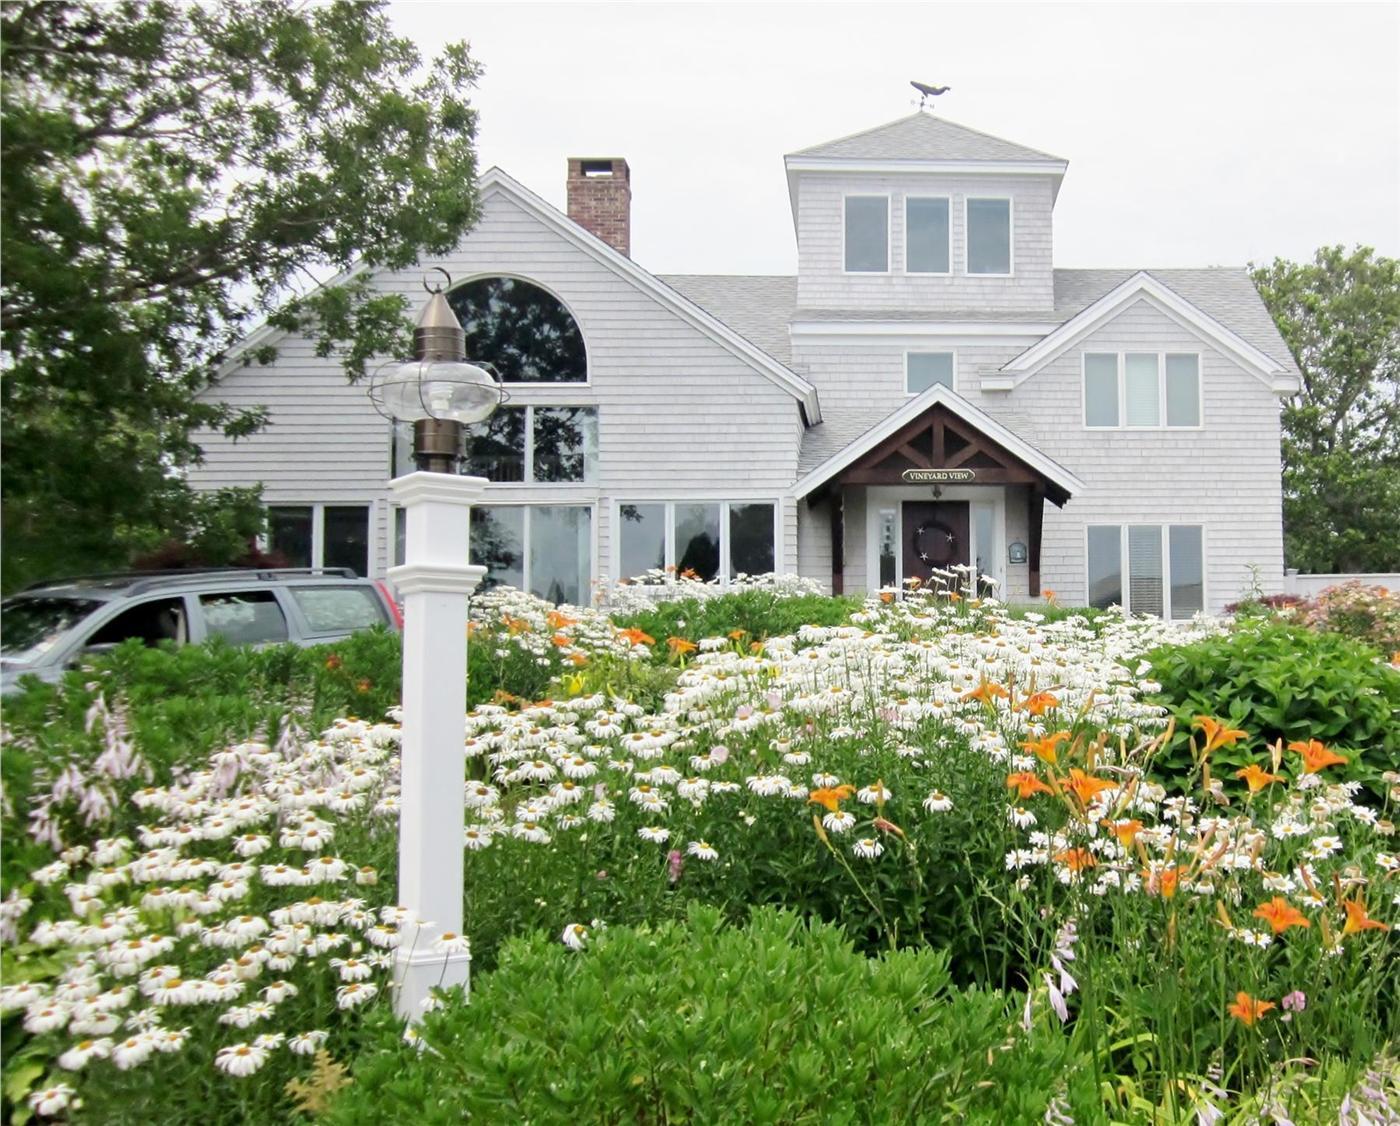 New Seabury Vacation Rental Home In New Seabury Ma 02649 Less Than Five Minute Walk Id 4138